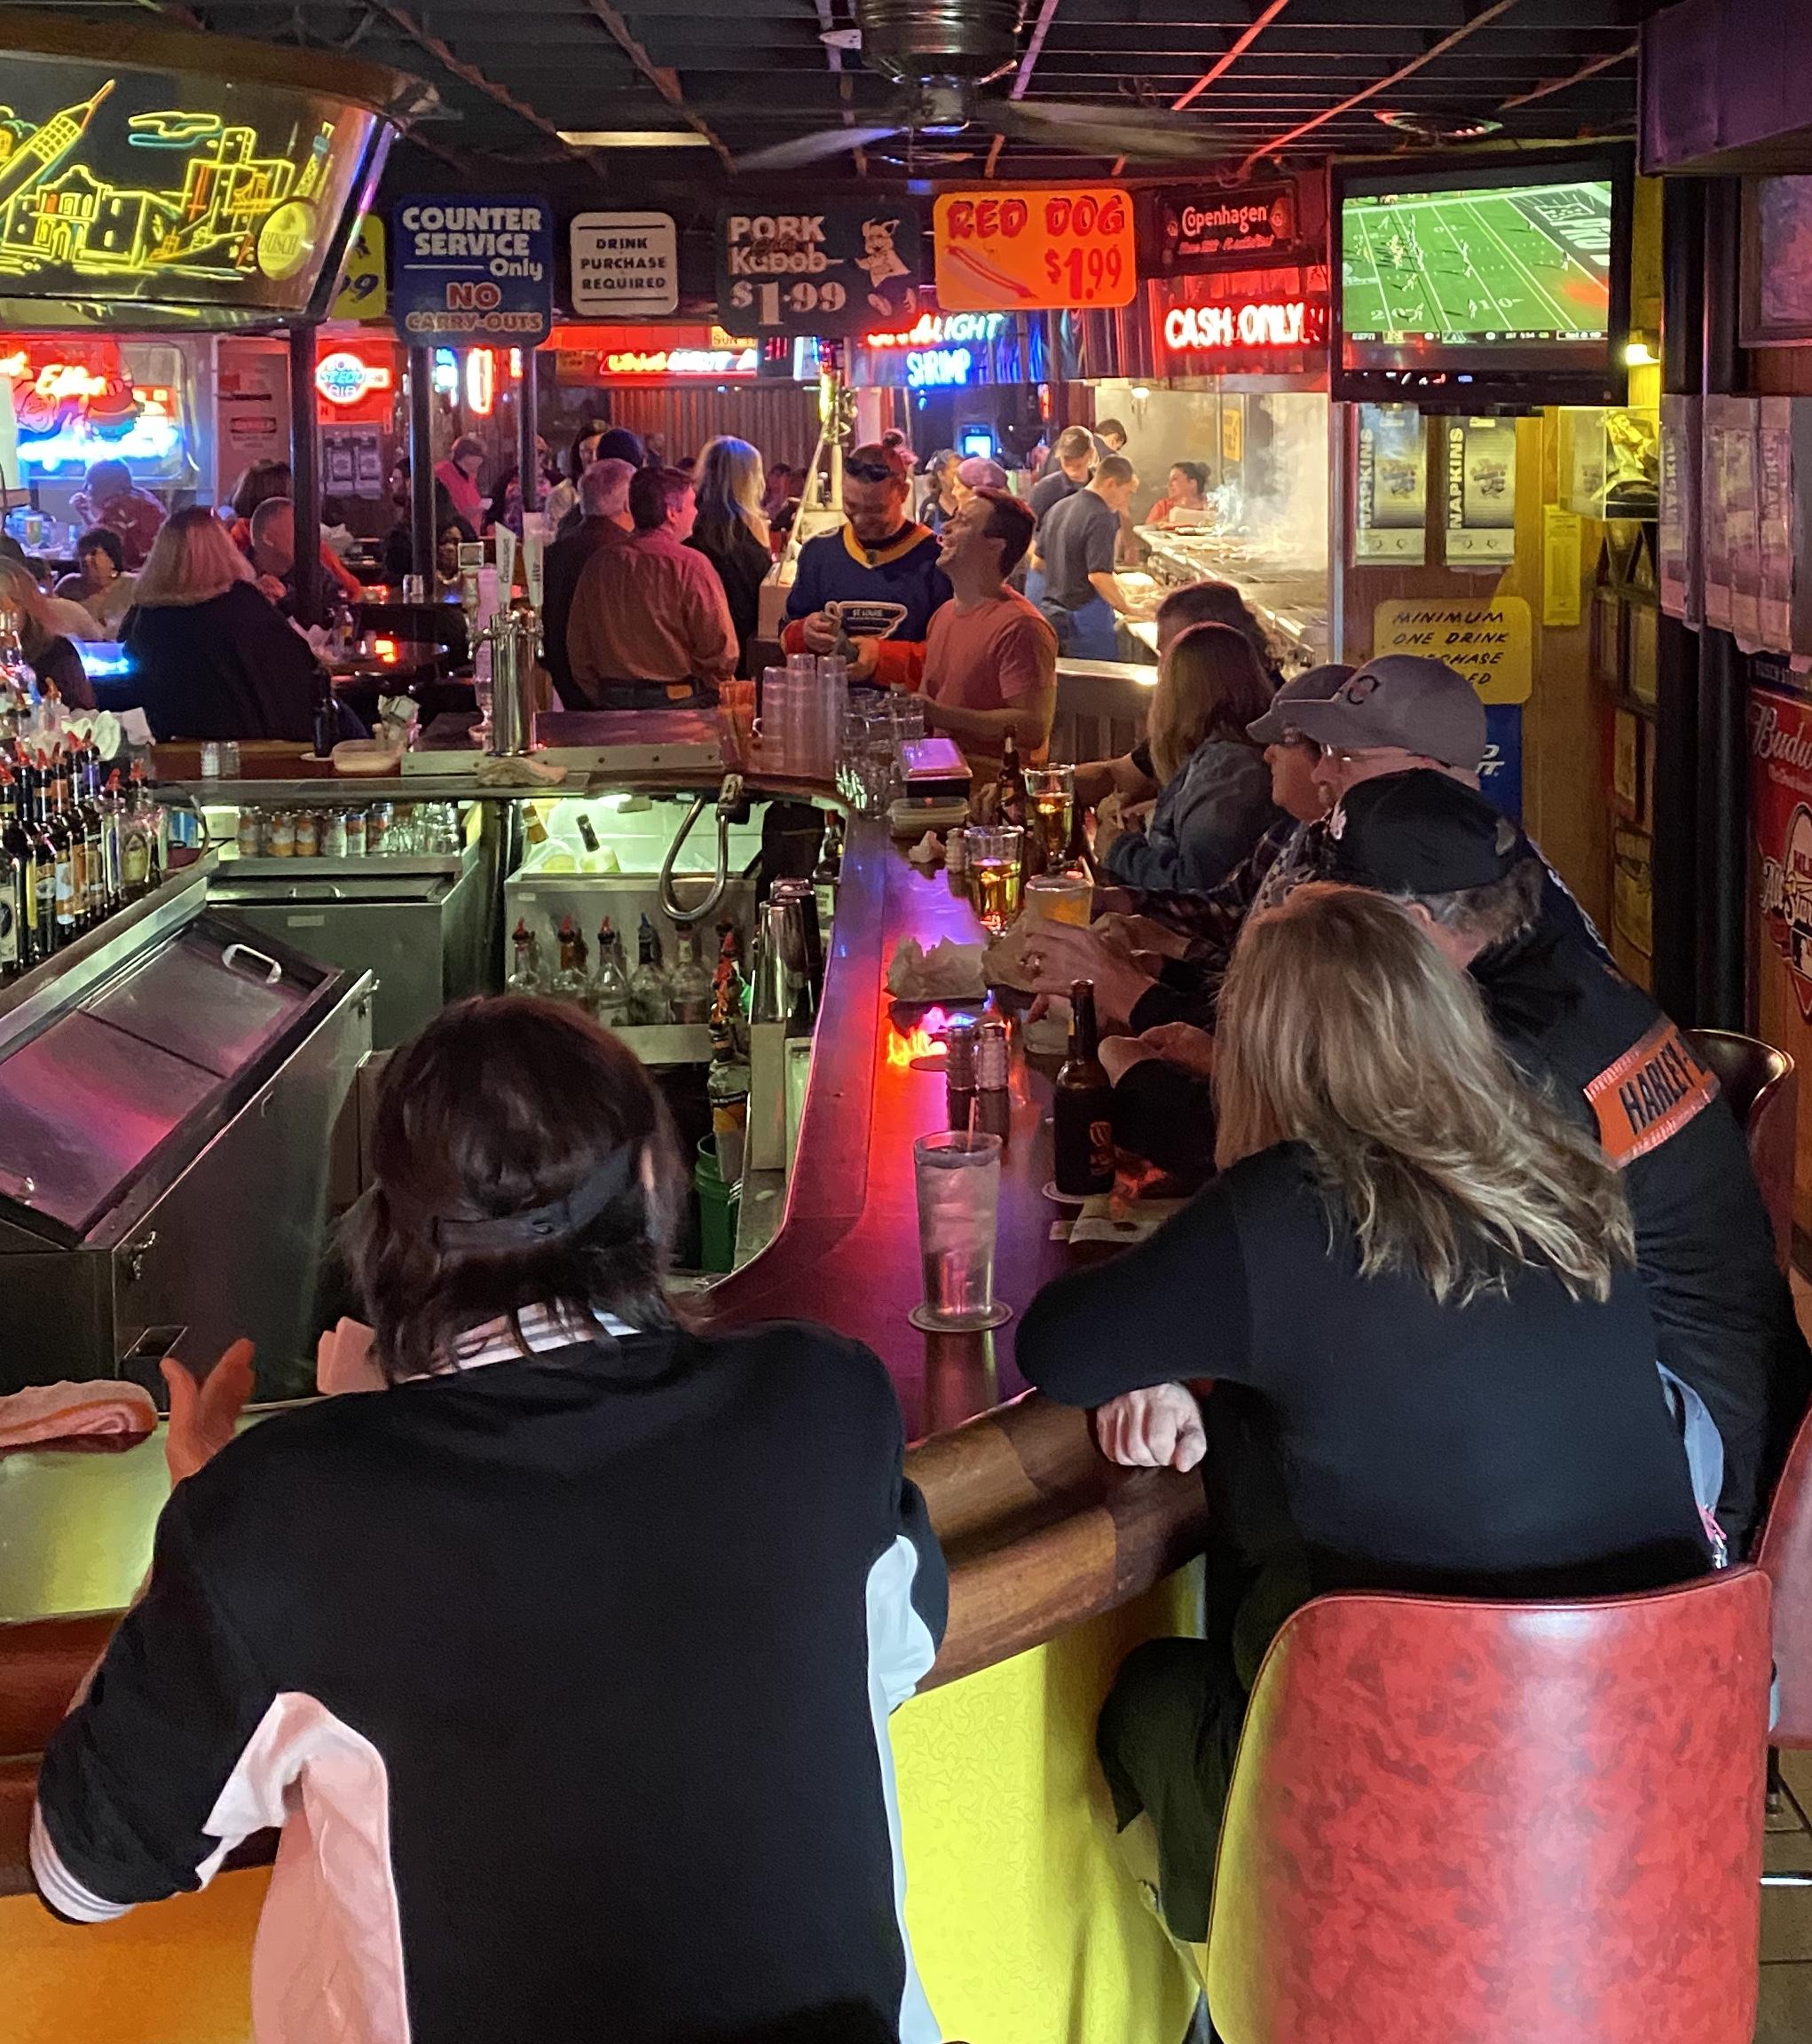 fast-eddies-bon-air-inside-bar-people